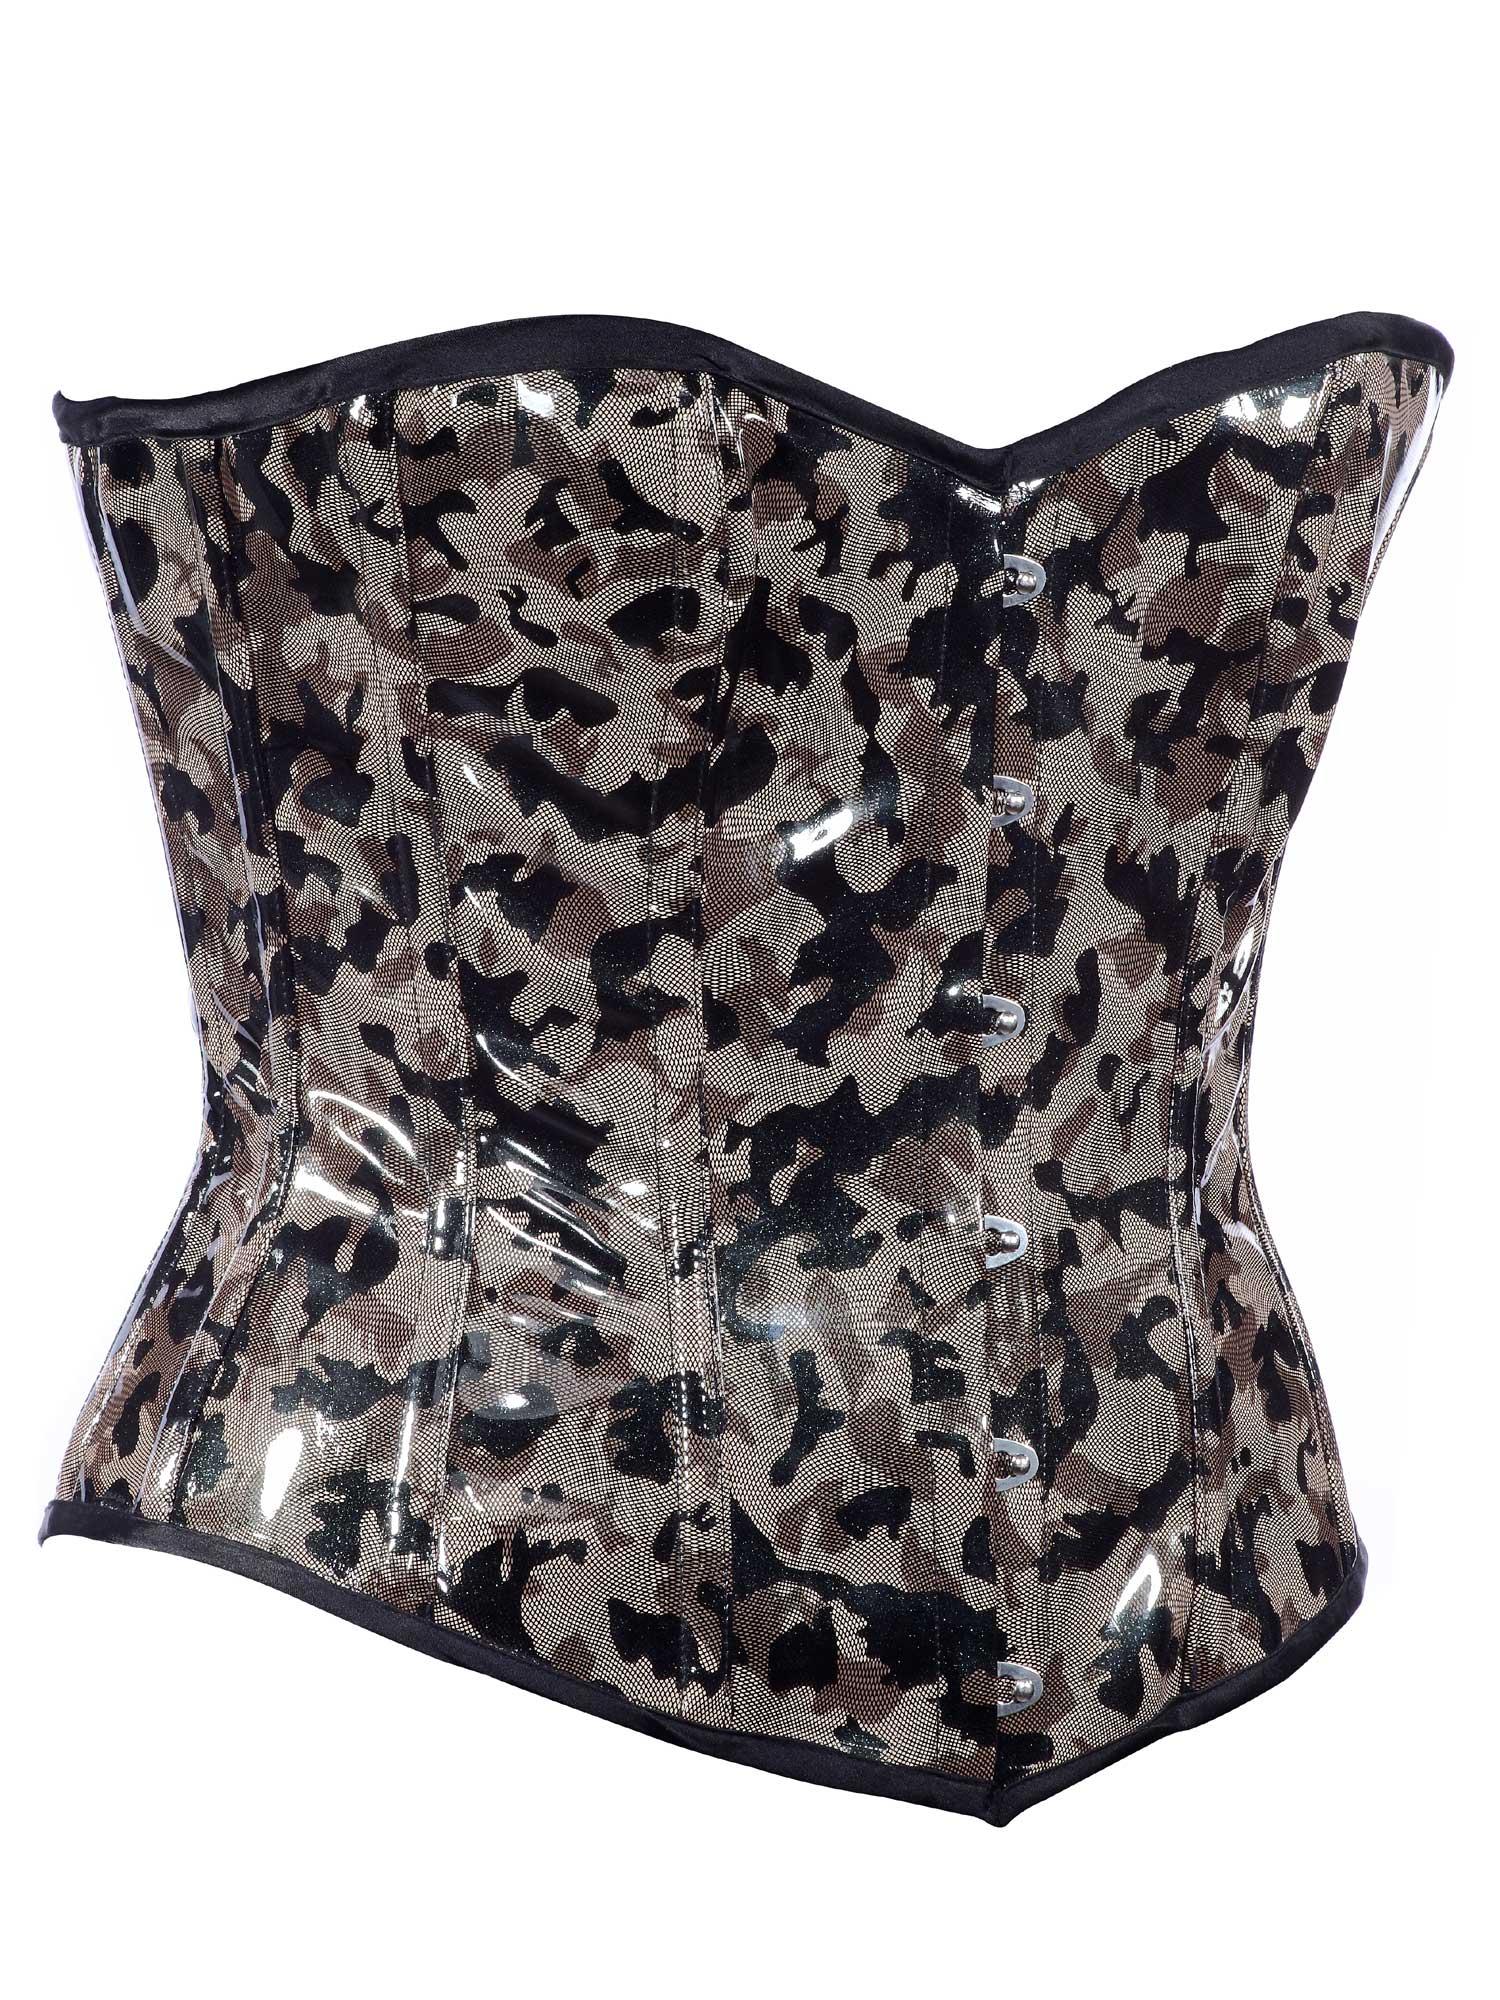 green_military_print_fabric_steel_boning_overbust_corset_waist_cincher_bustier_bustiers_and_corsets_4.jpg